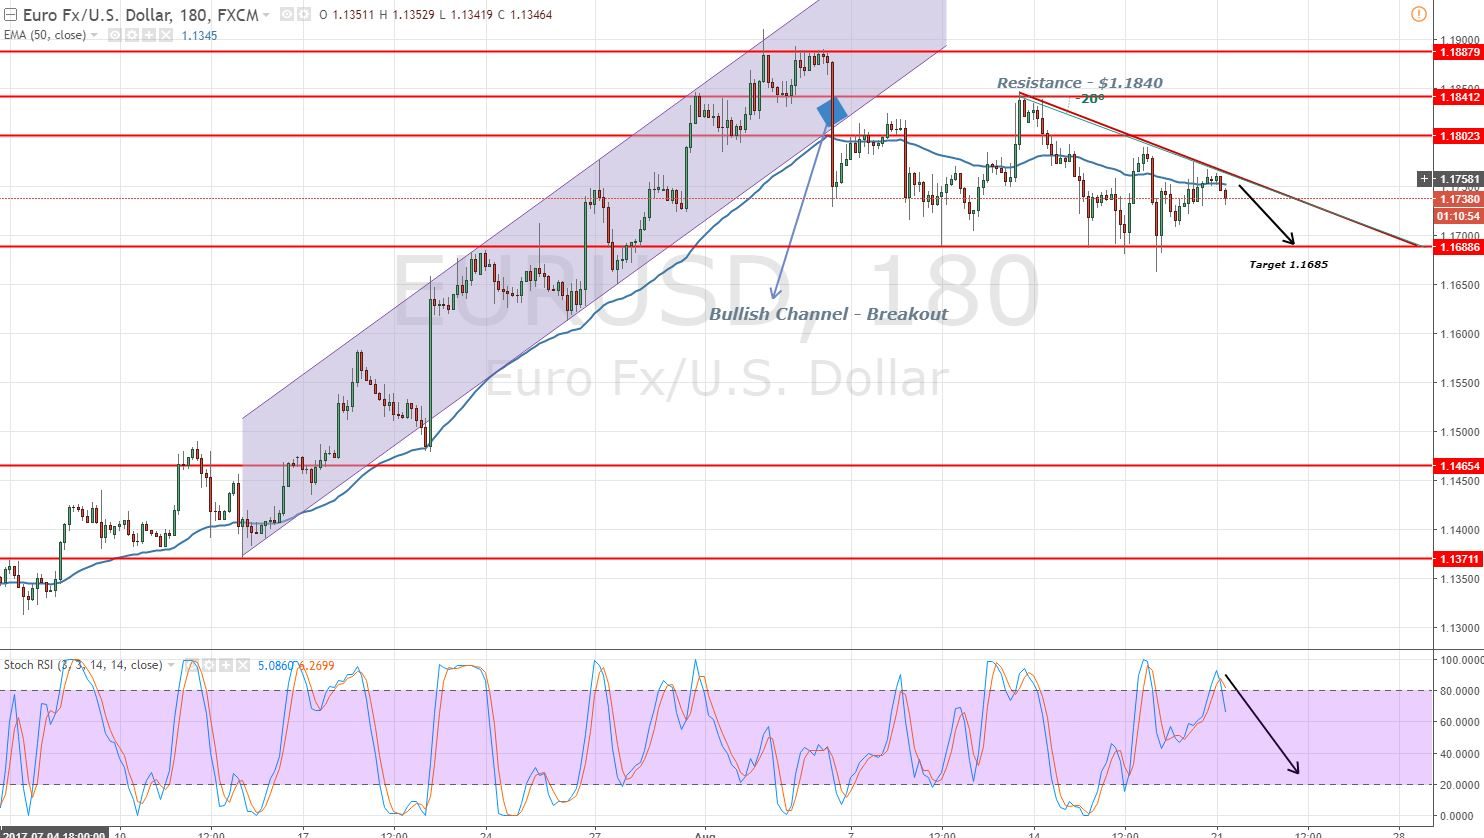 EURUSD - 3 Hour Chart - Descending Triangle Pattern